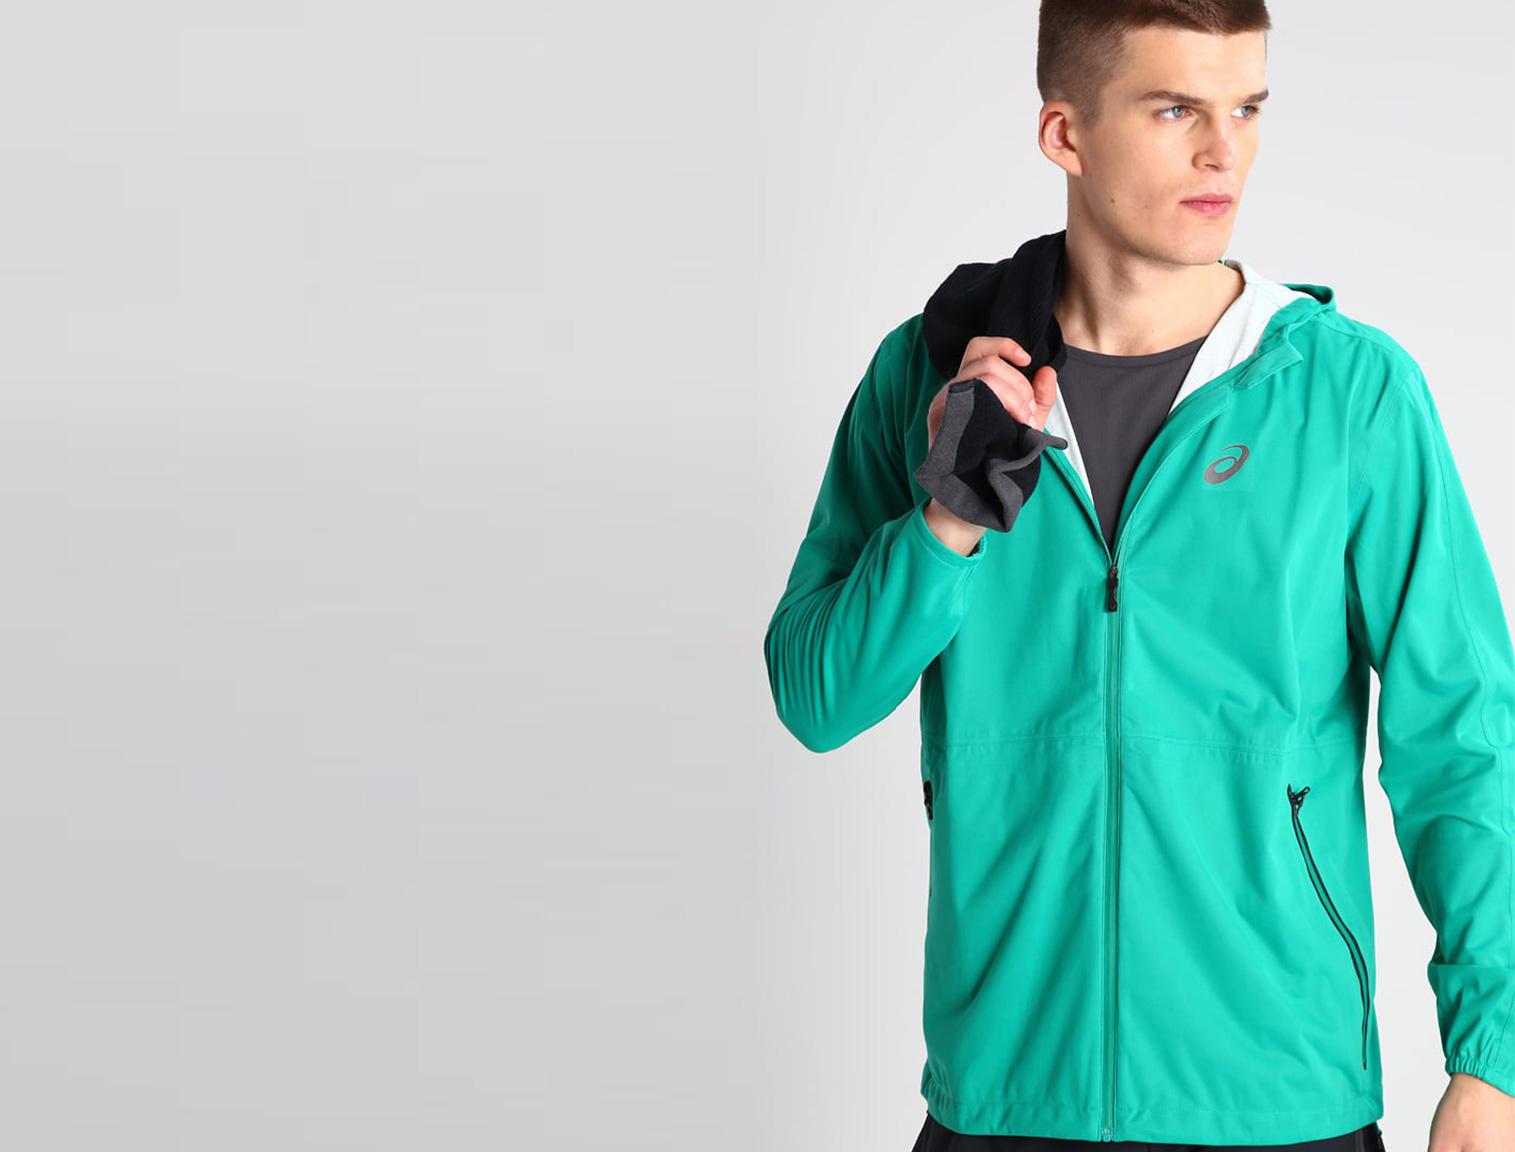 Hombre con chaqueta running verde